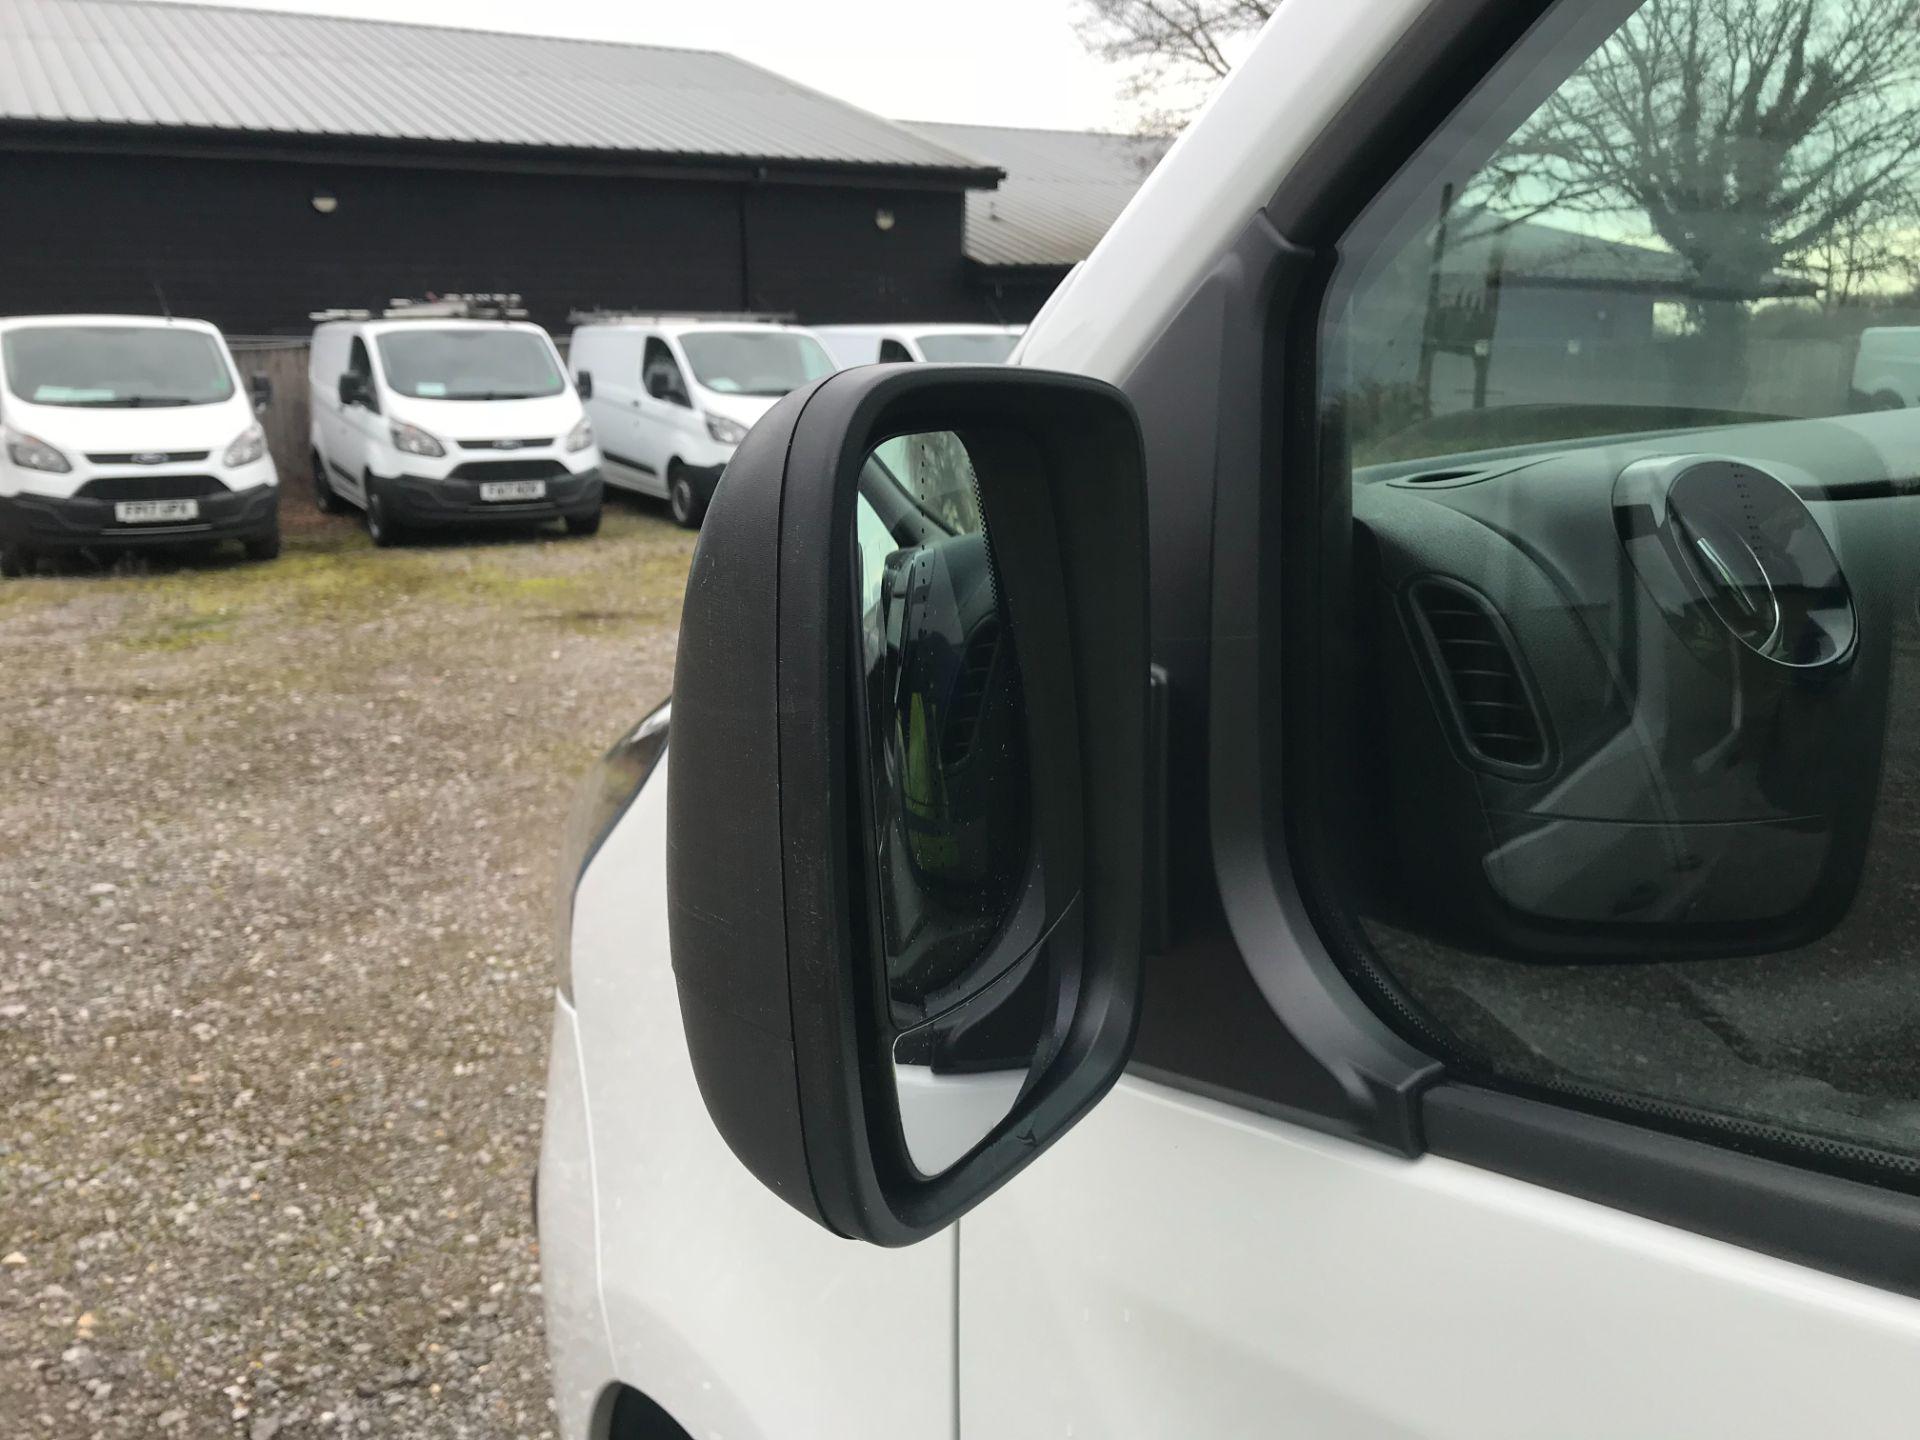 2019 Vauxhall Vivaro L2 H1 2900 1.6CDTI 120PS SPORTIVE EURO 6 (DV19YZY) Image 28